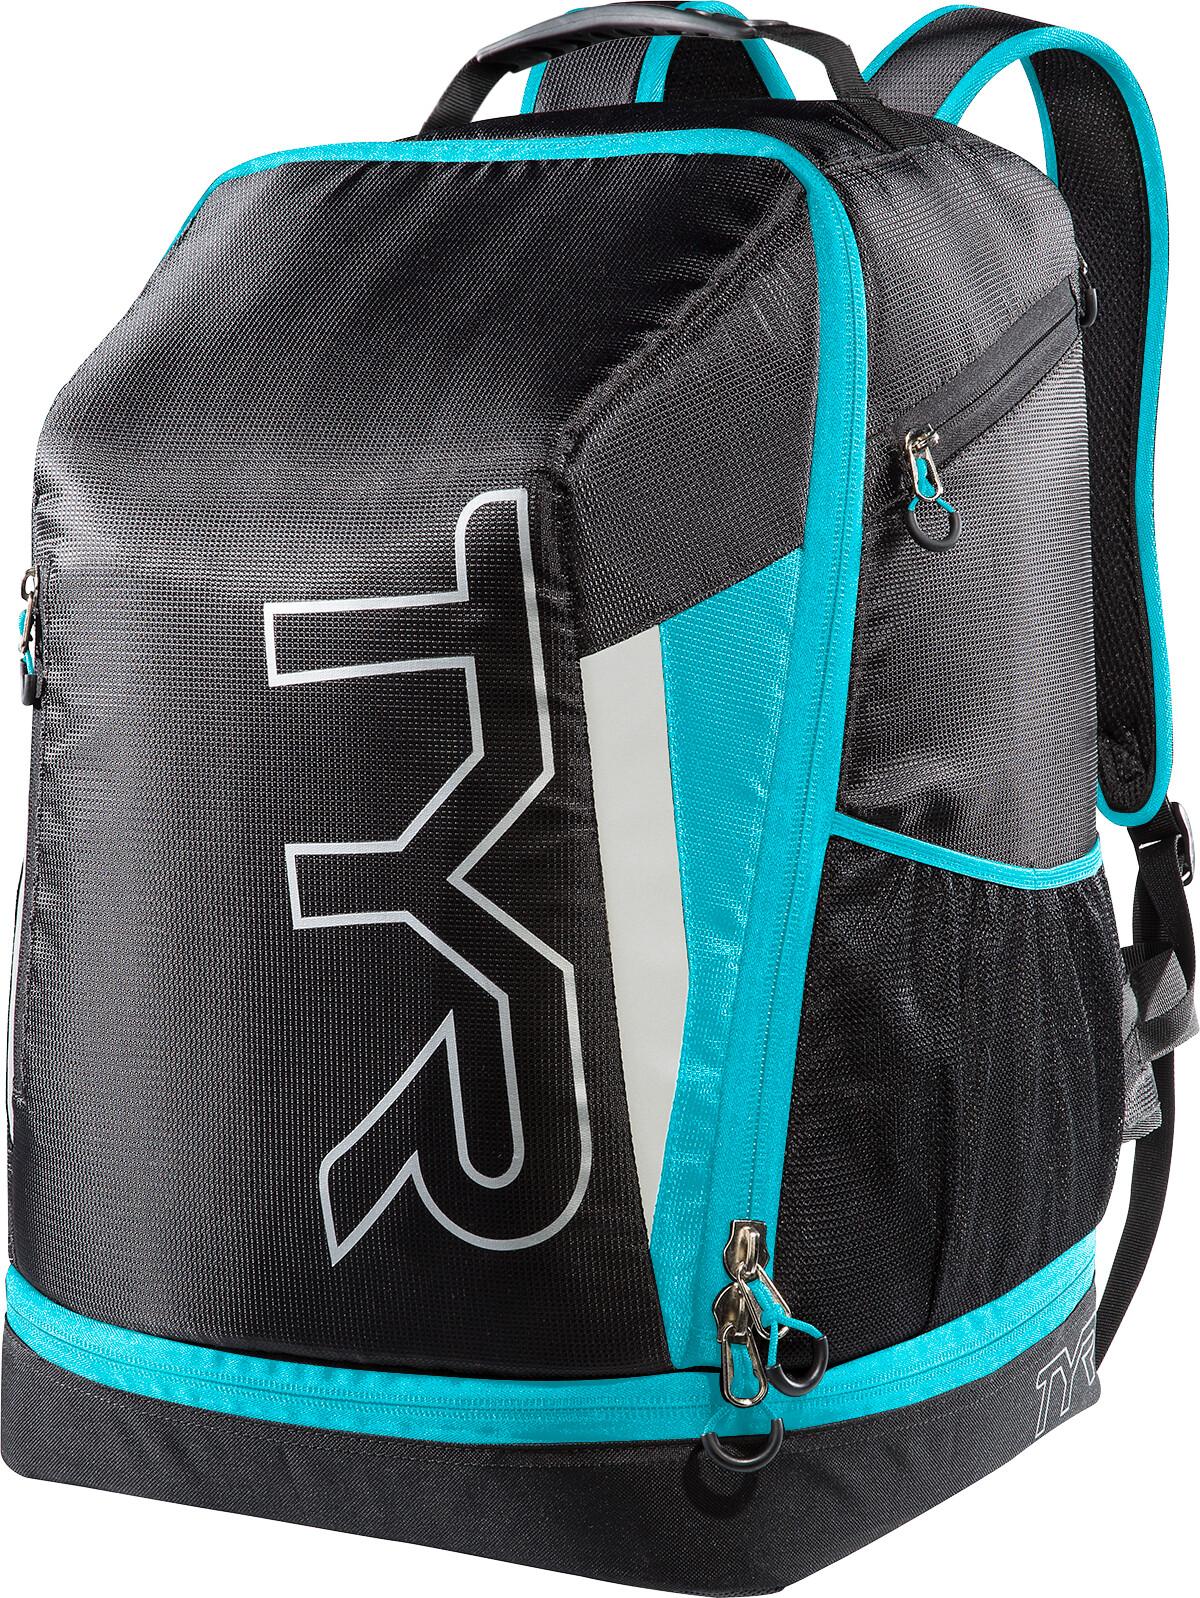 TYR Triathlon Svømmerygsæk, black/blue (2019) | Travel bags